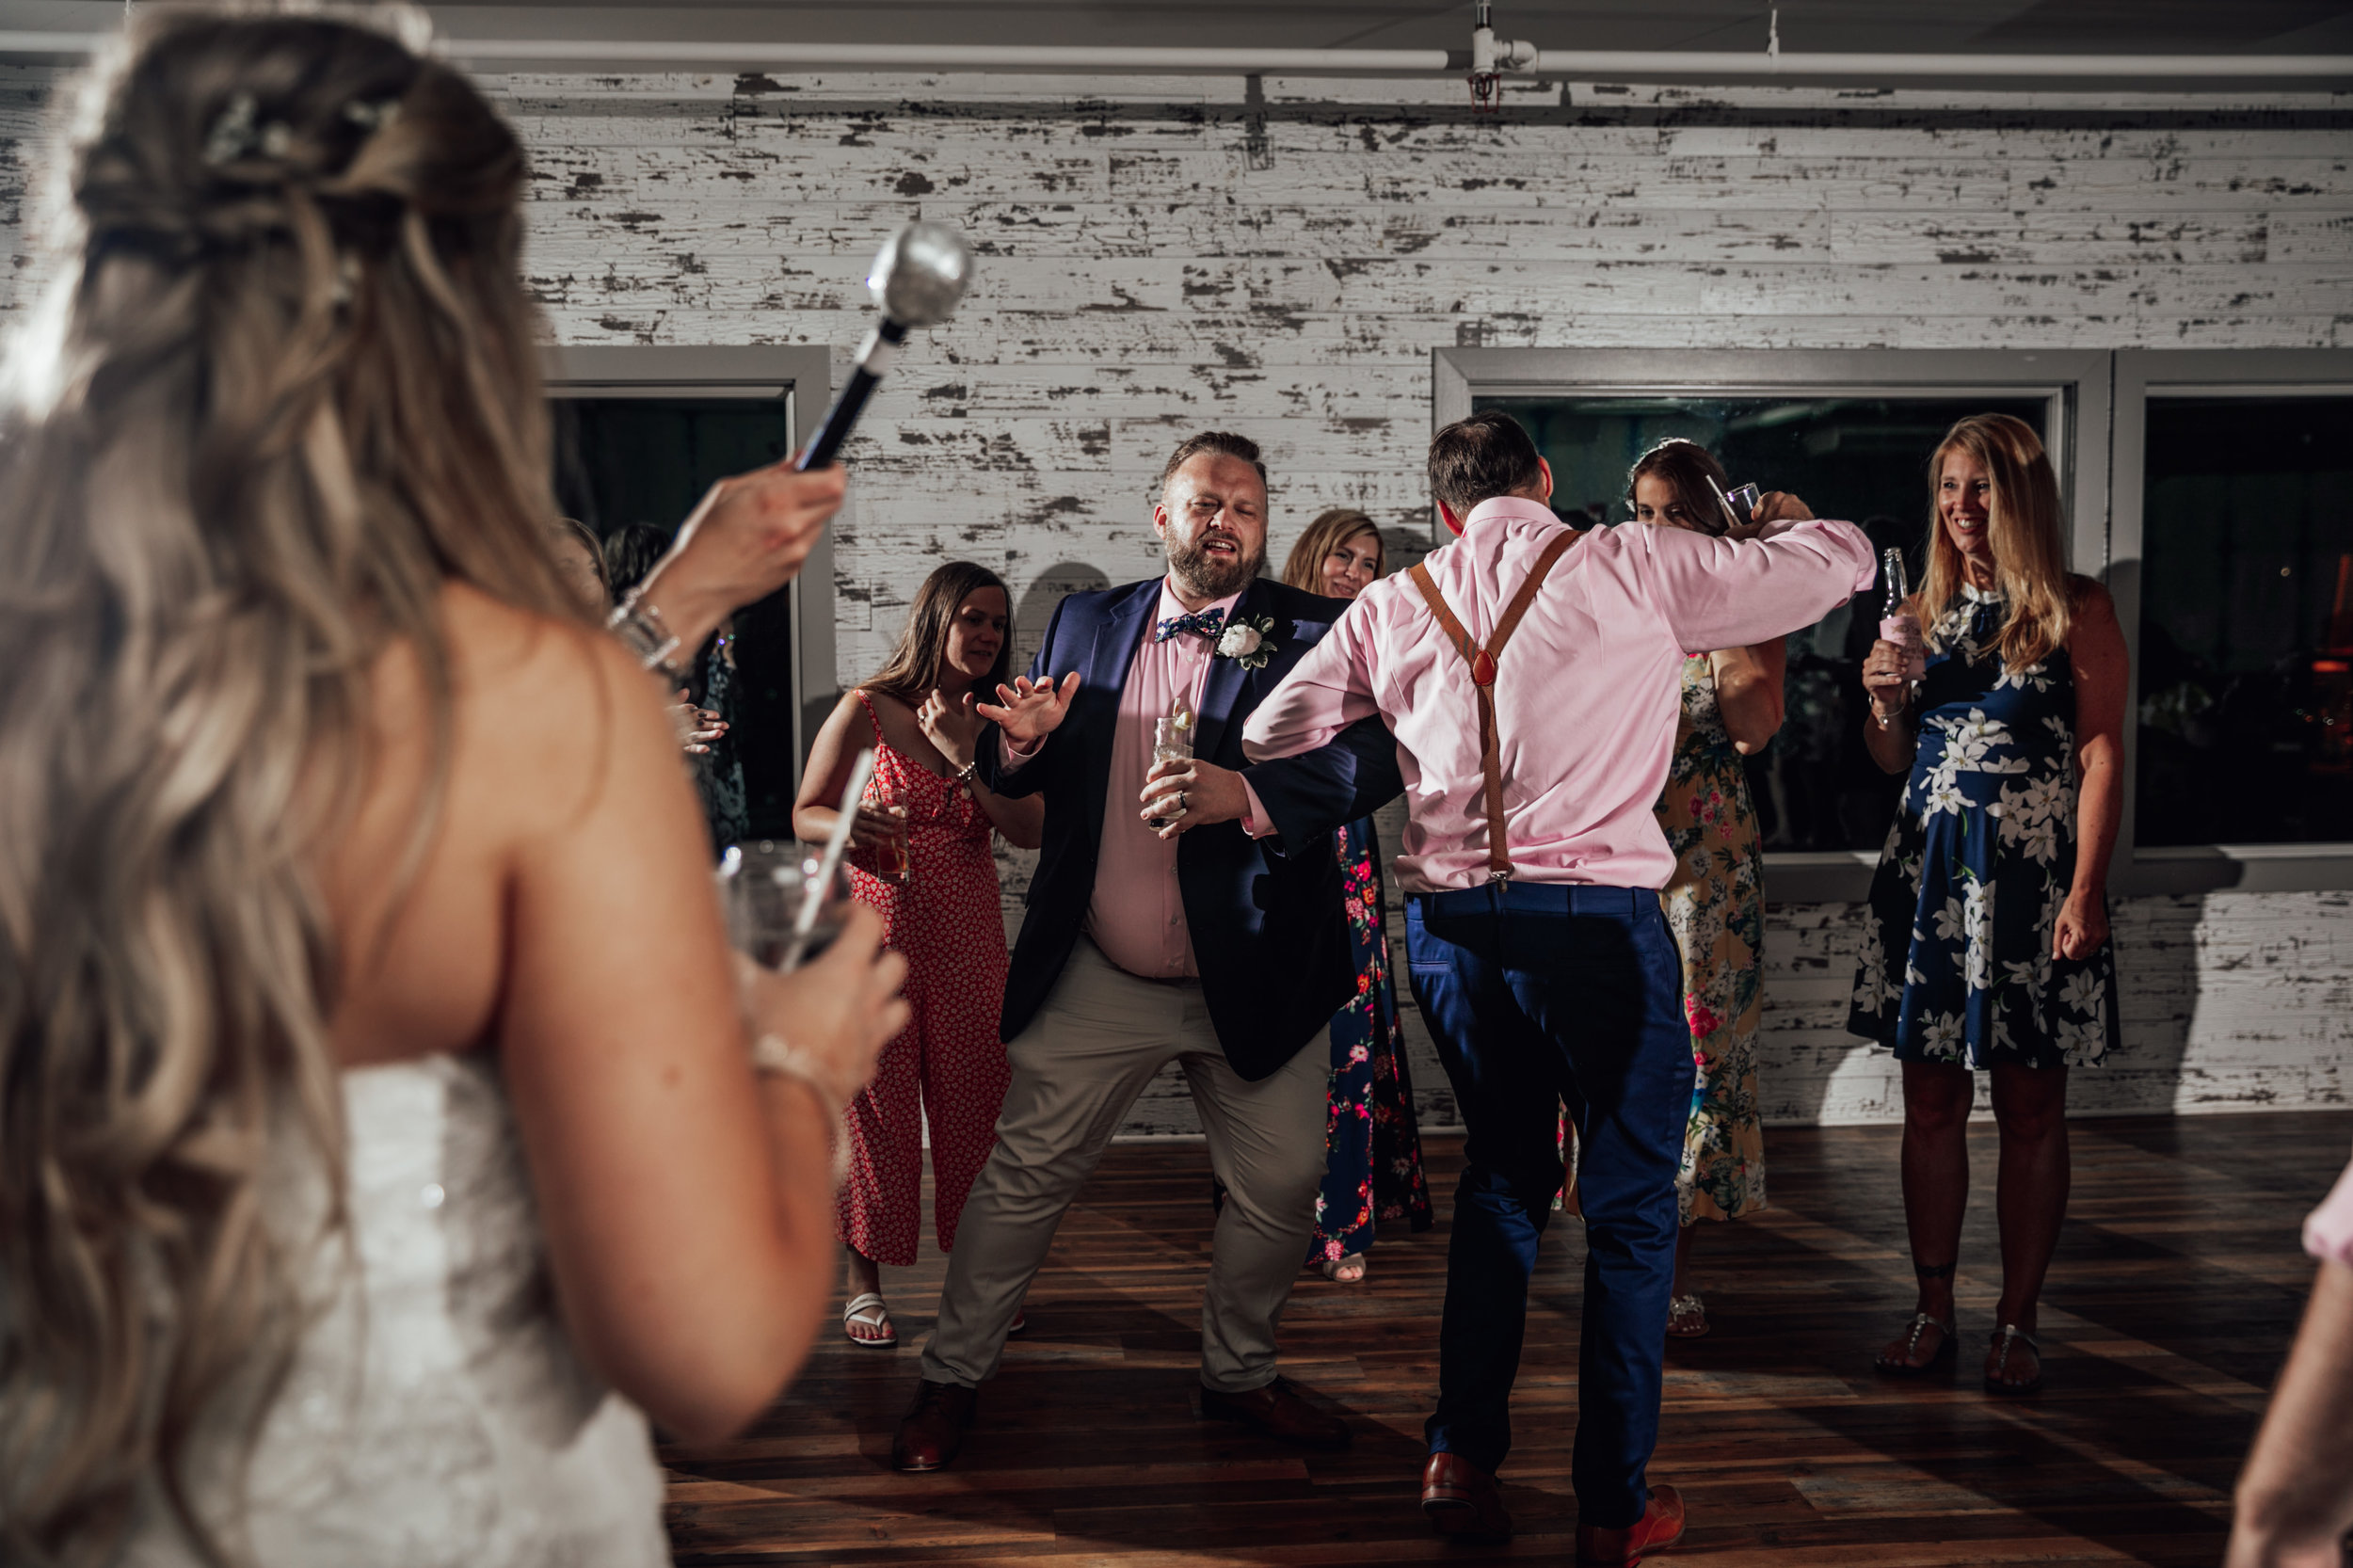 New Jersey Wedding Photographer, Felsberg Photography LBI wedding photography 123.jpg